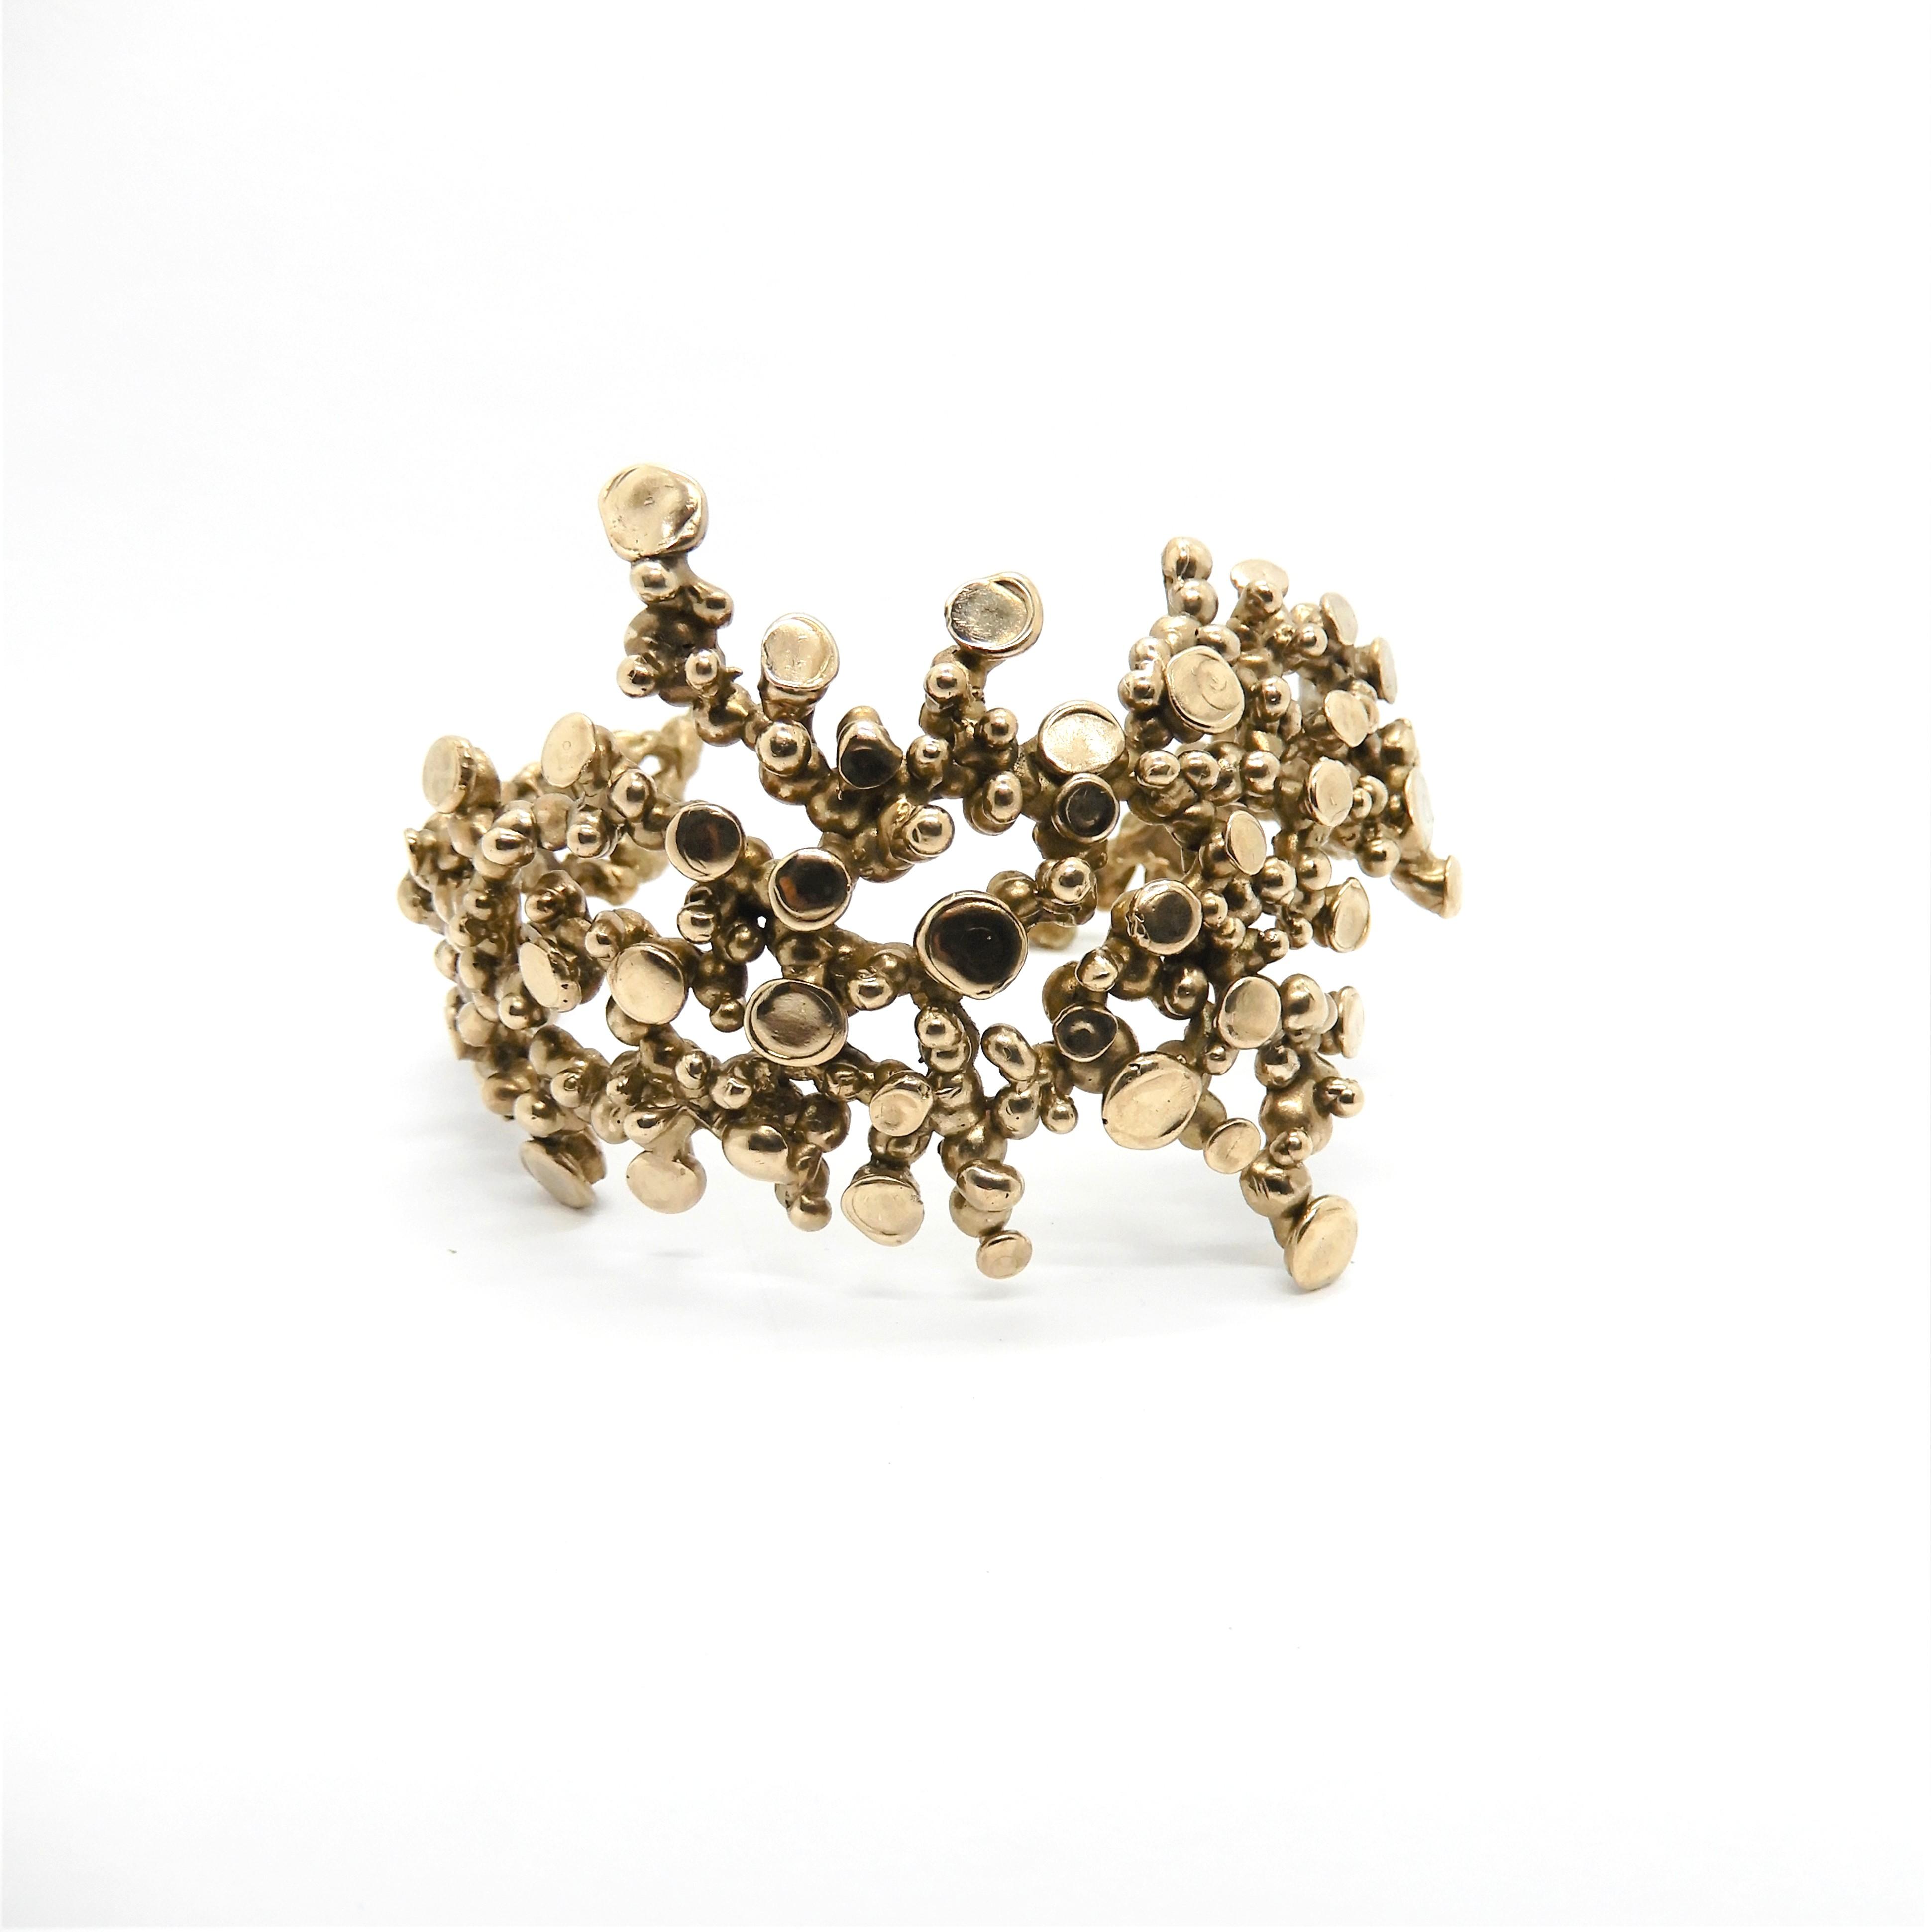 eg-eleonora-ghilardi-jewels-goldsmiths-and-jewellers-lodi-thumbnail